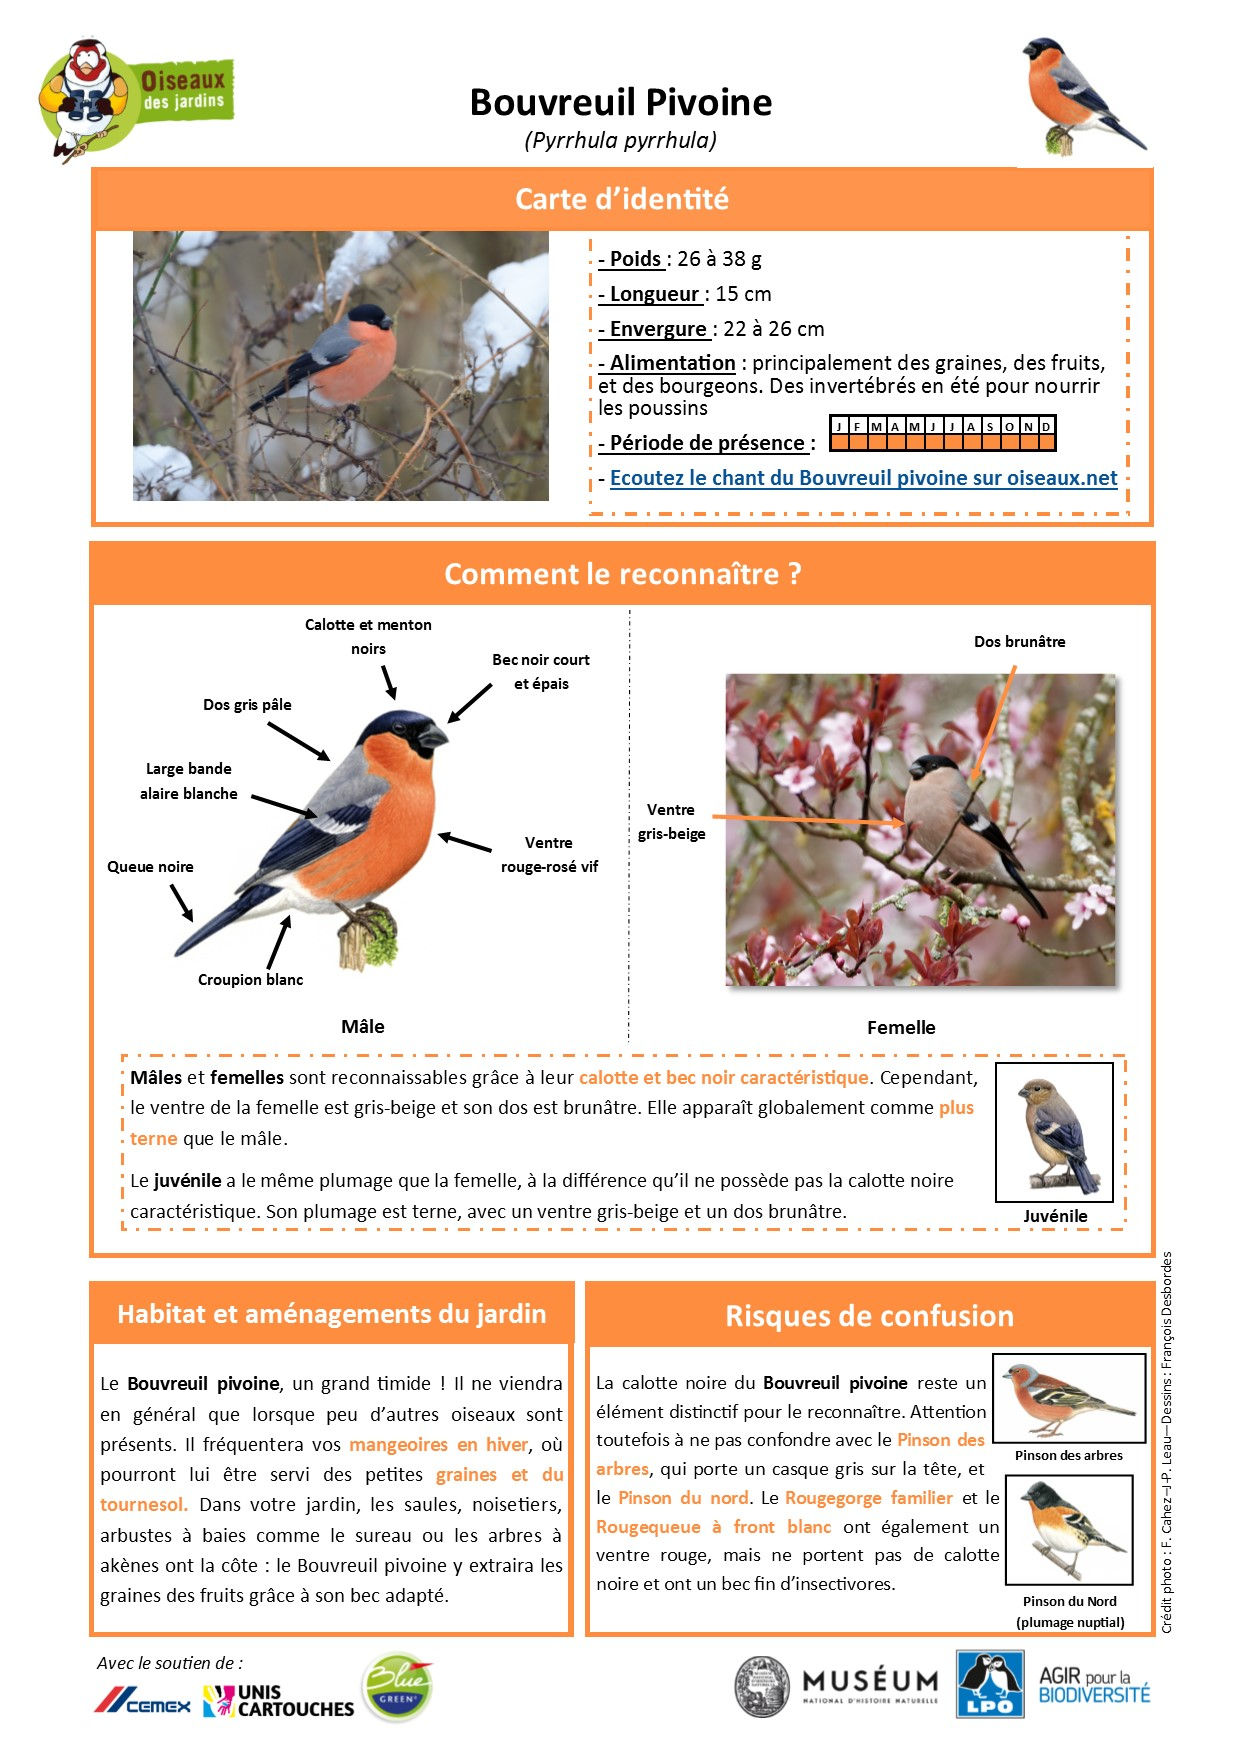 https://cdnfiles2.biolovision.net/www.oiseauxdesjardins.fr/userfiles/Fichesespces/FicheespceBP.pdf